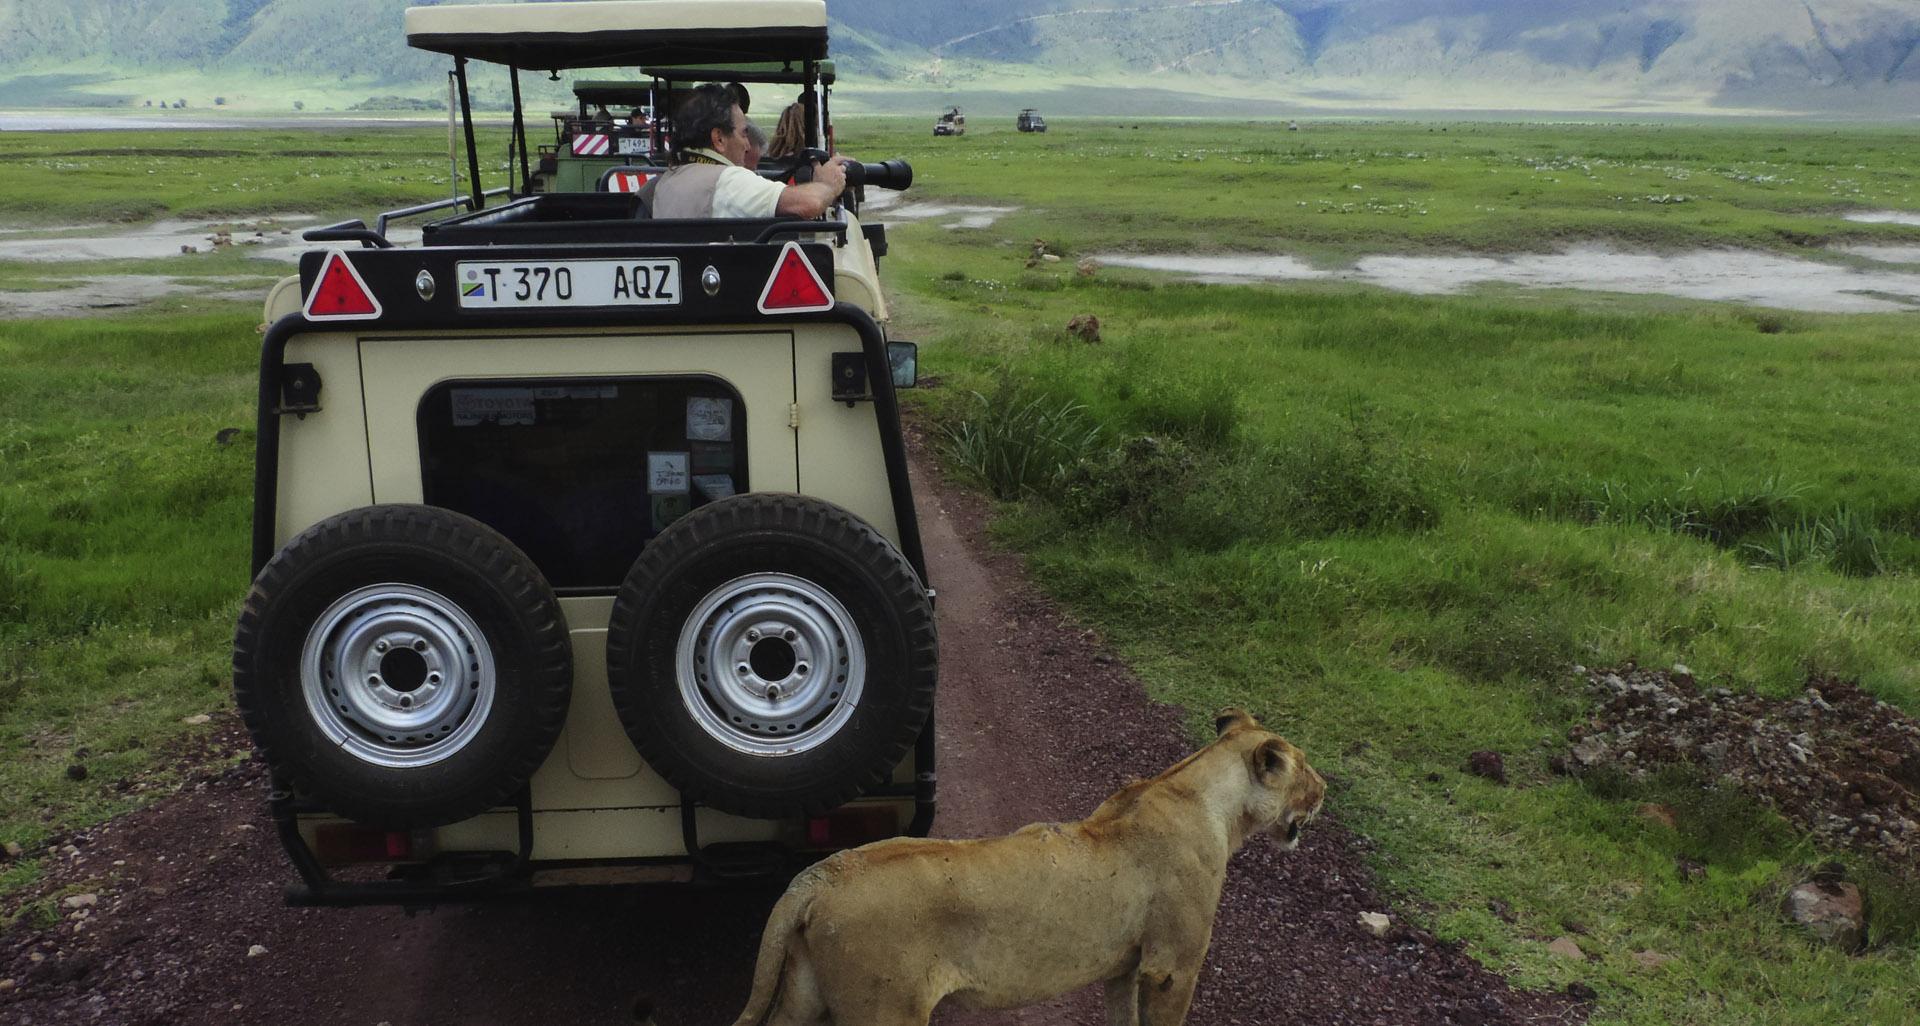 Ngorongoro crater, Safari Crew Tanzania, safari organizing